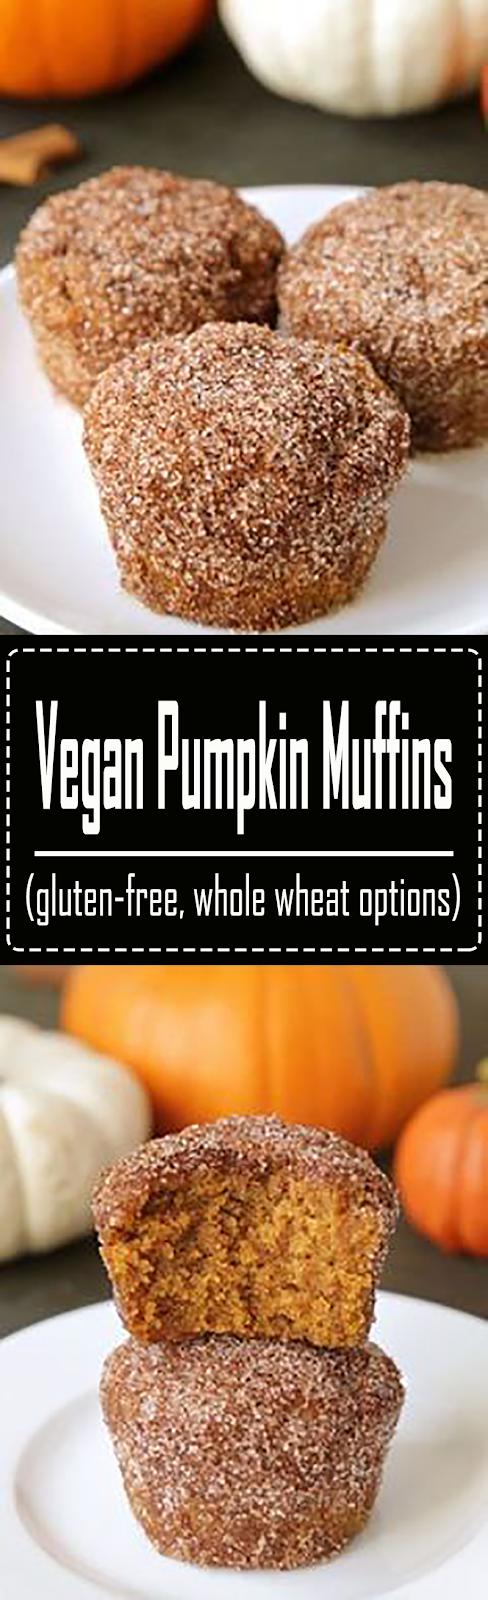 Vegan Pumpkin Muffins (gluten-free, whole wheat options) #HealthyDinnerRecipesEasy